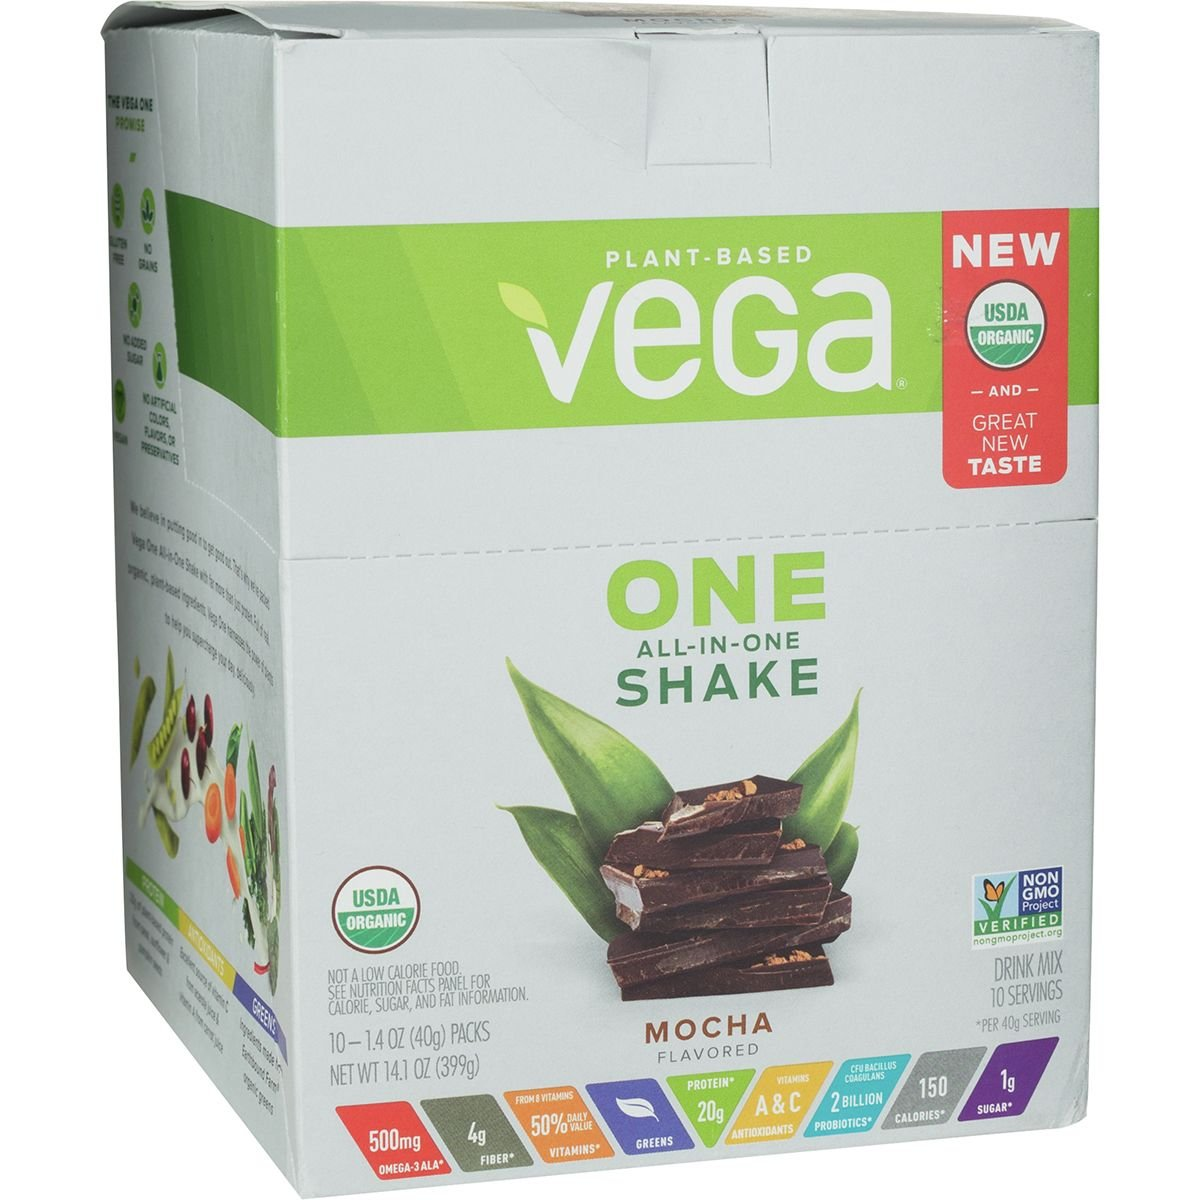 Vega Nutrition One Organic Shake - 10-Pack Mocha, 10x1.4oz